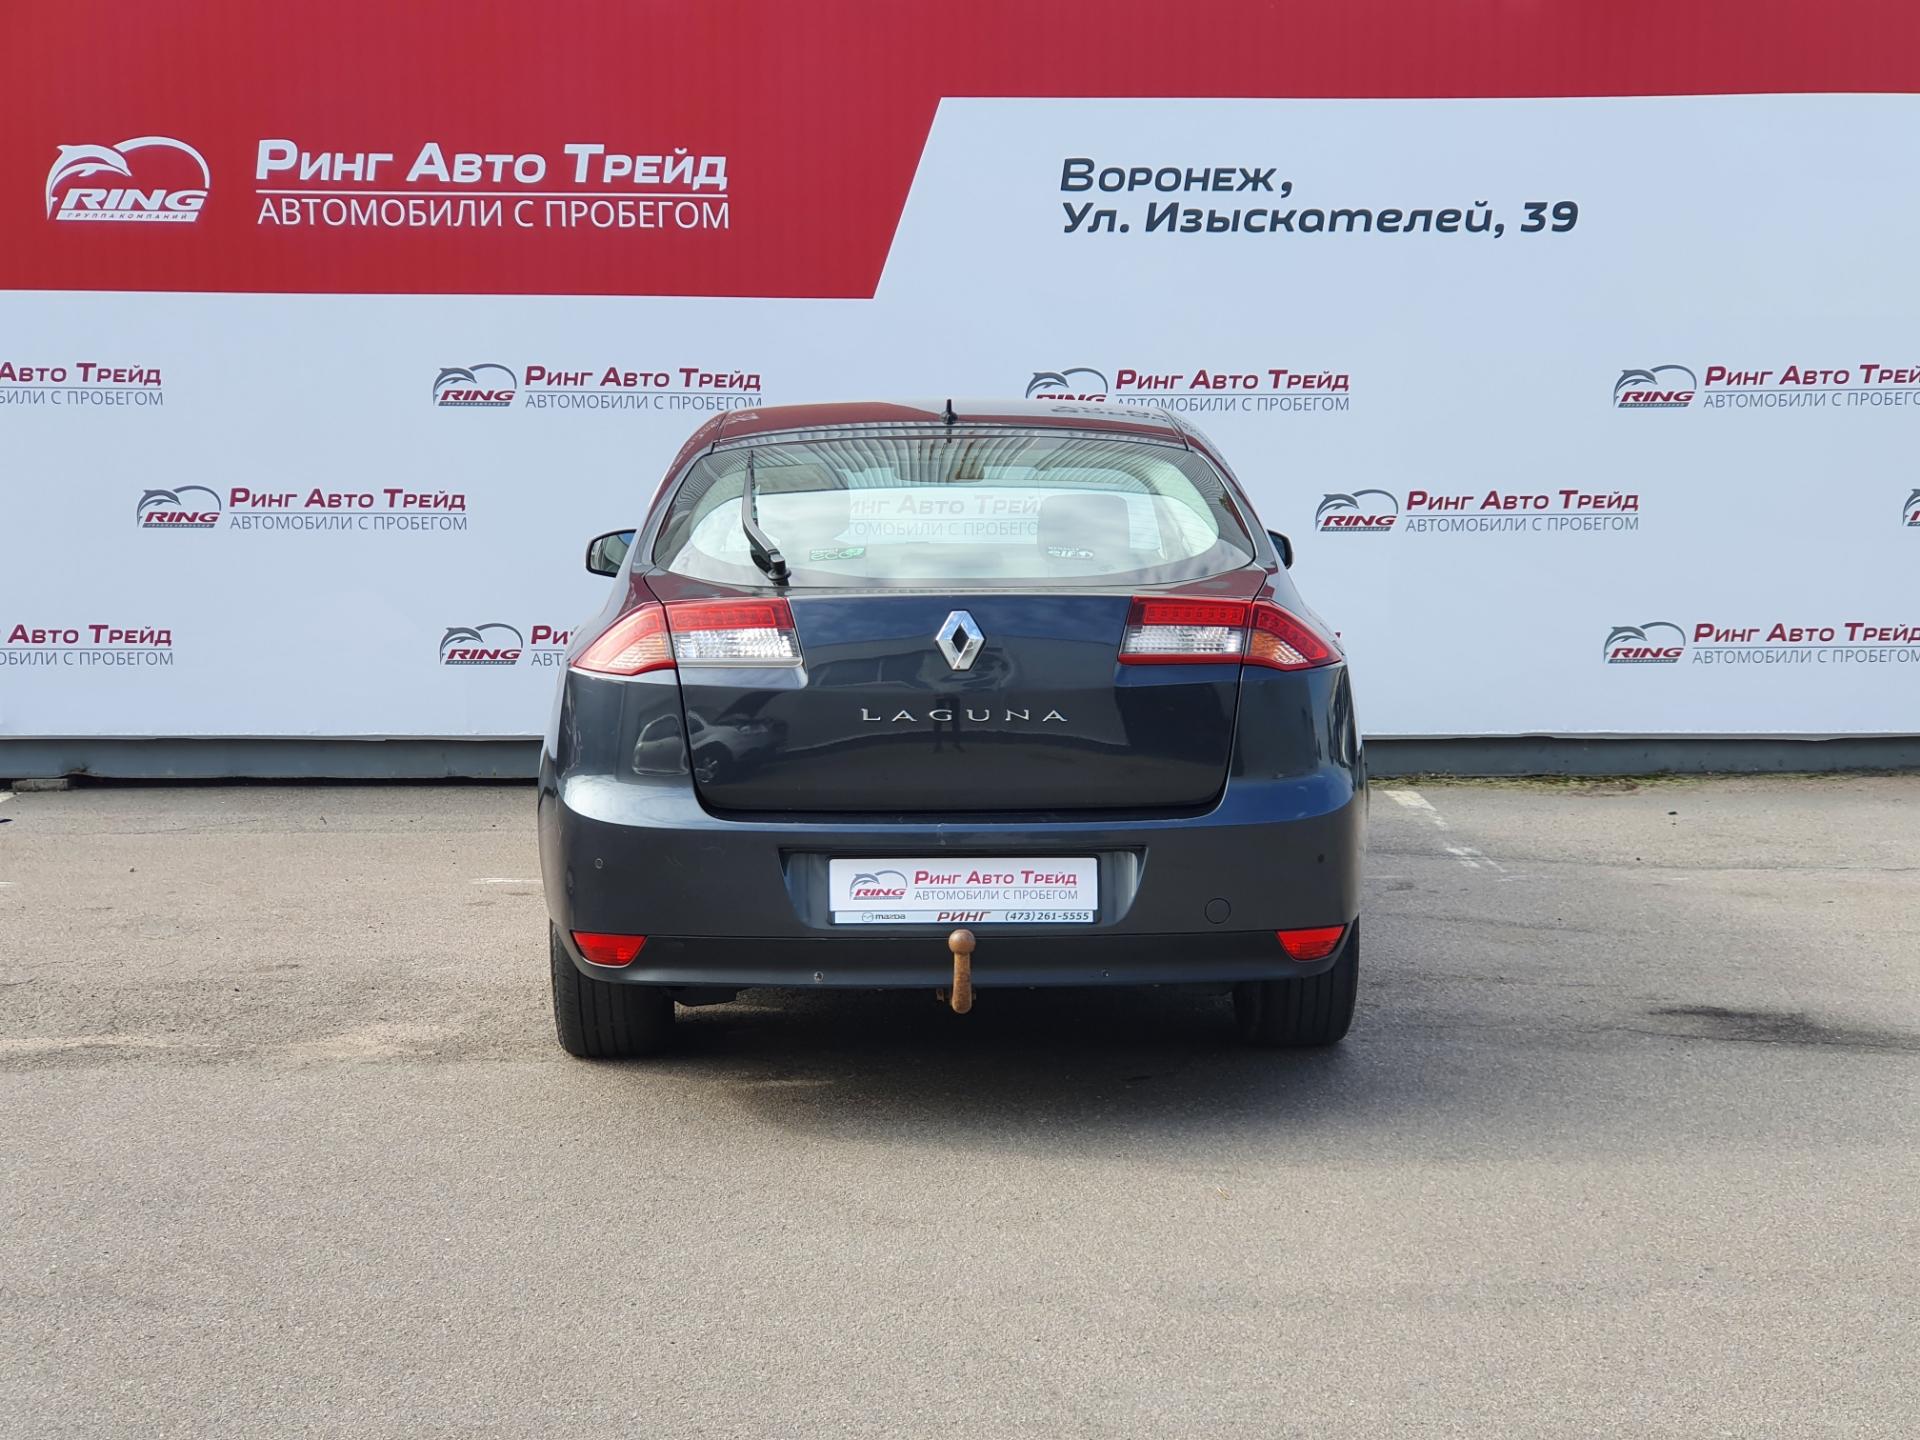 Renault Laguna Хэтчбек (2011г.)